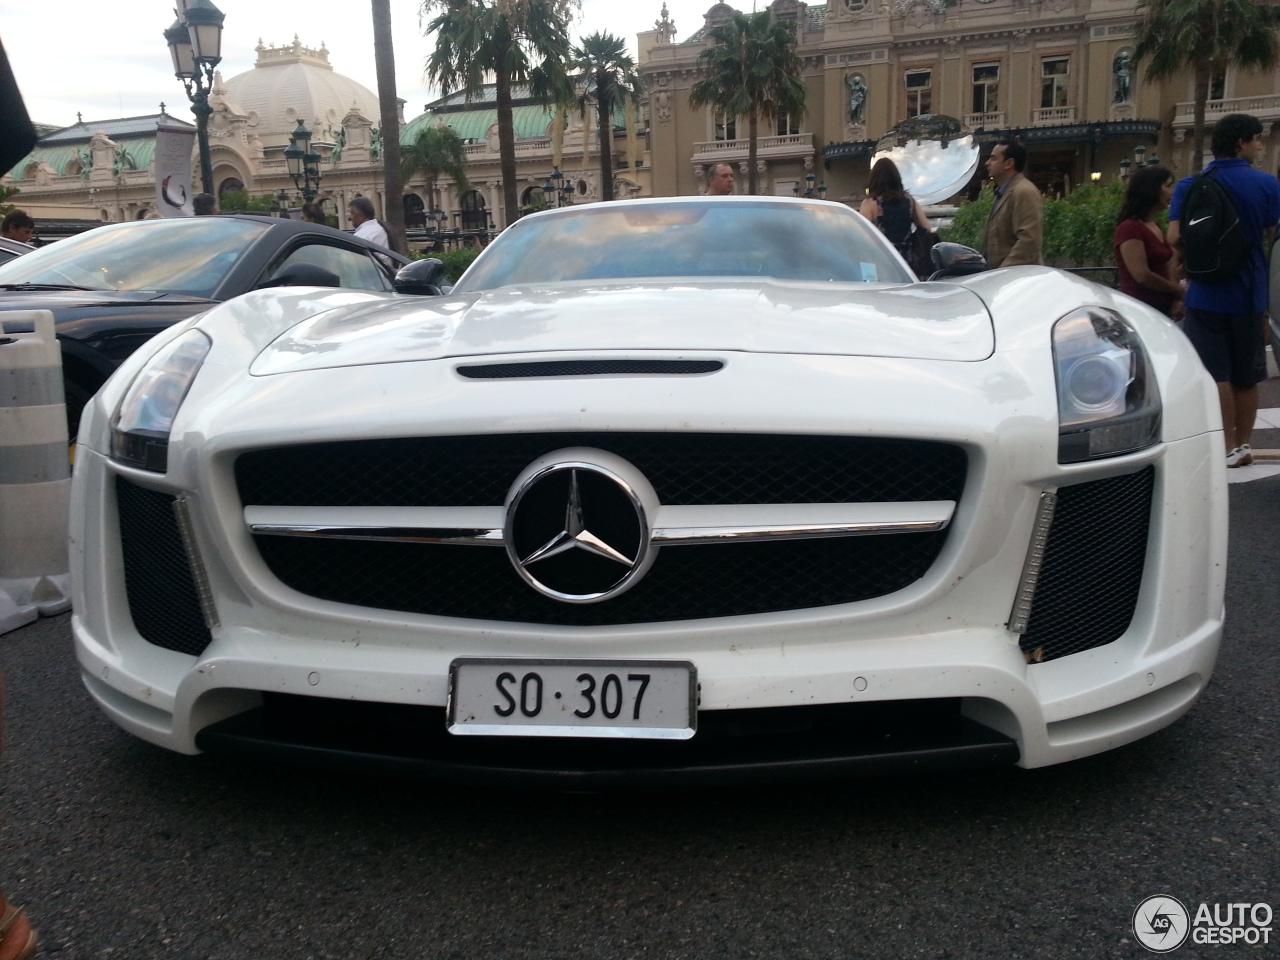 Mercedes benz fab design sls amg jetstream roadster 21 for 2014 mercedes benz sls amg price